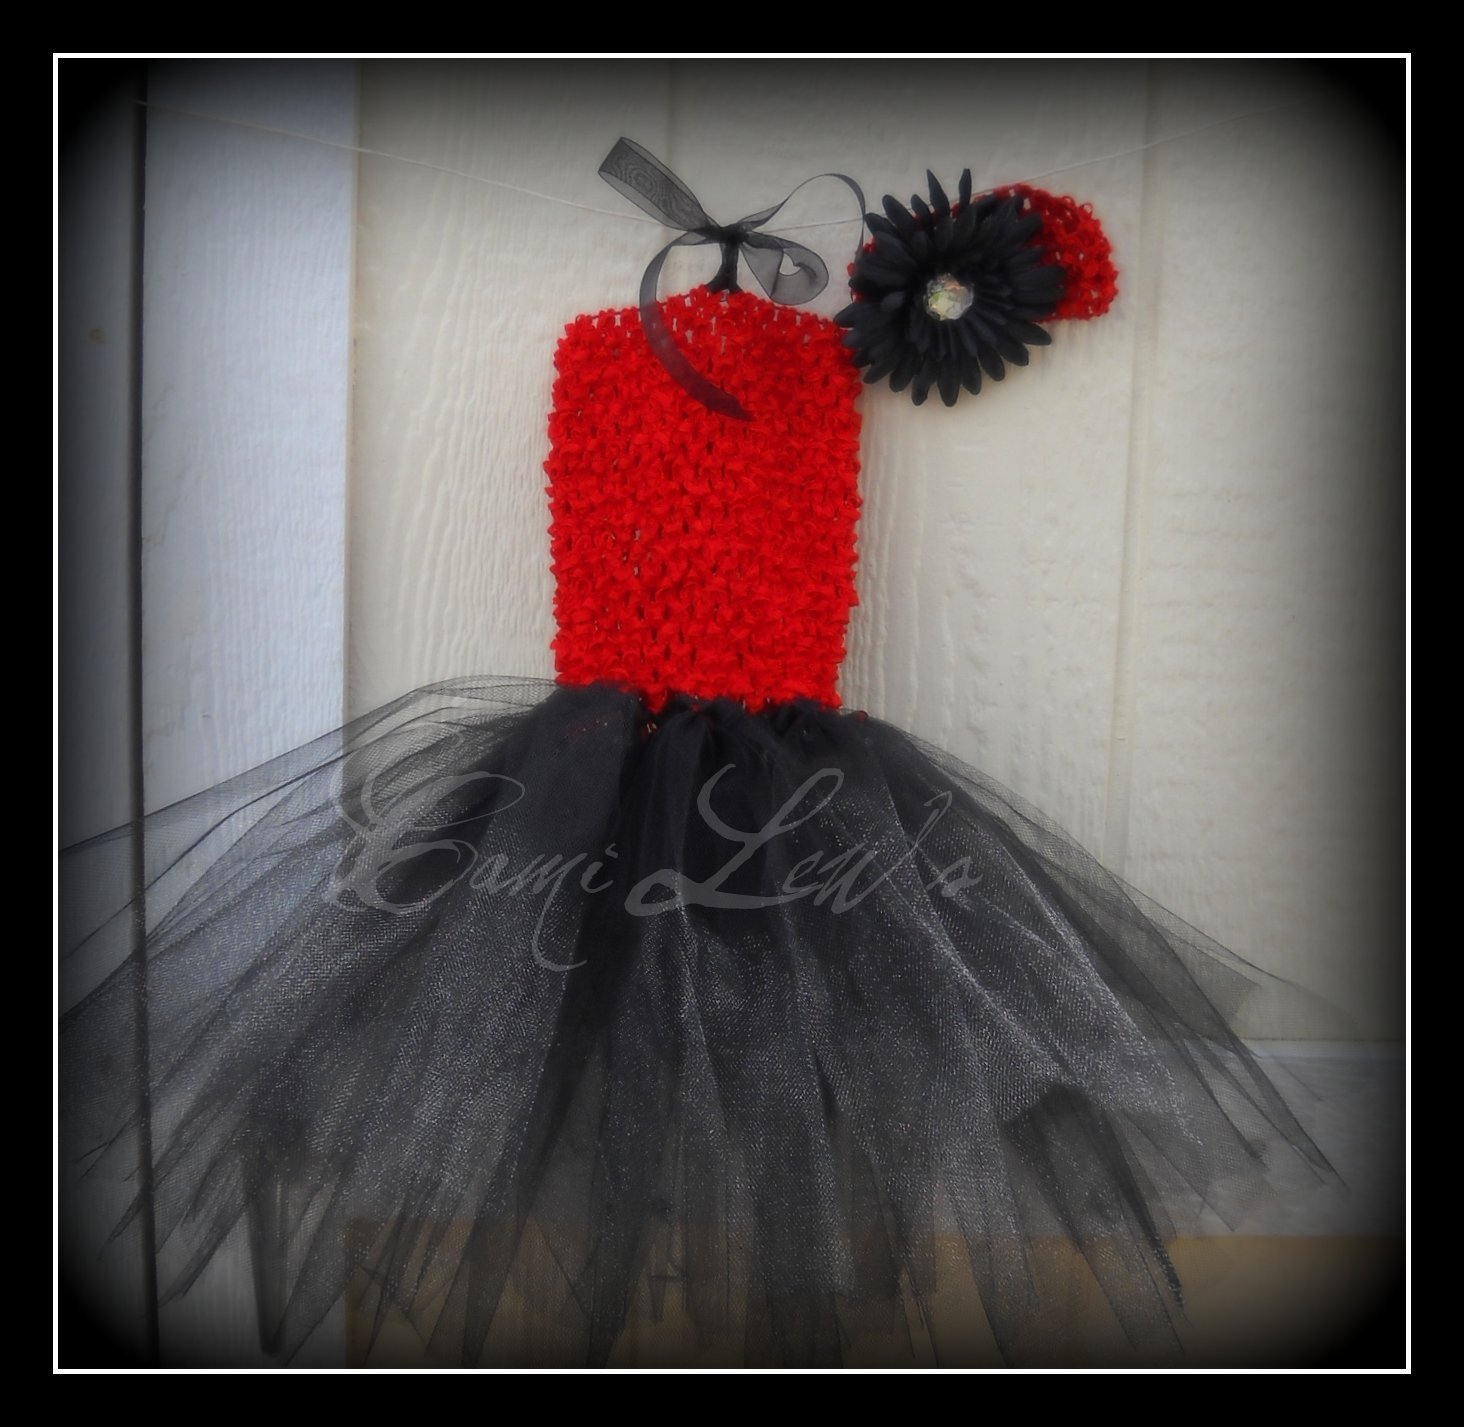 Red and black tutu haulter dress